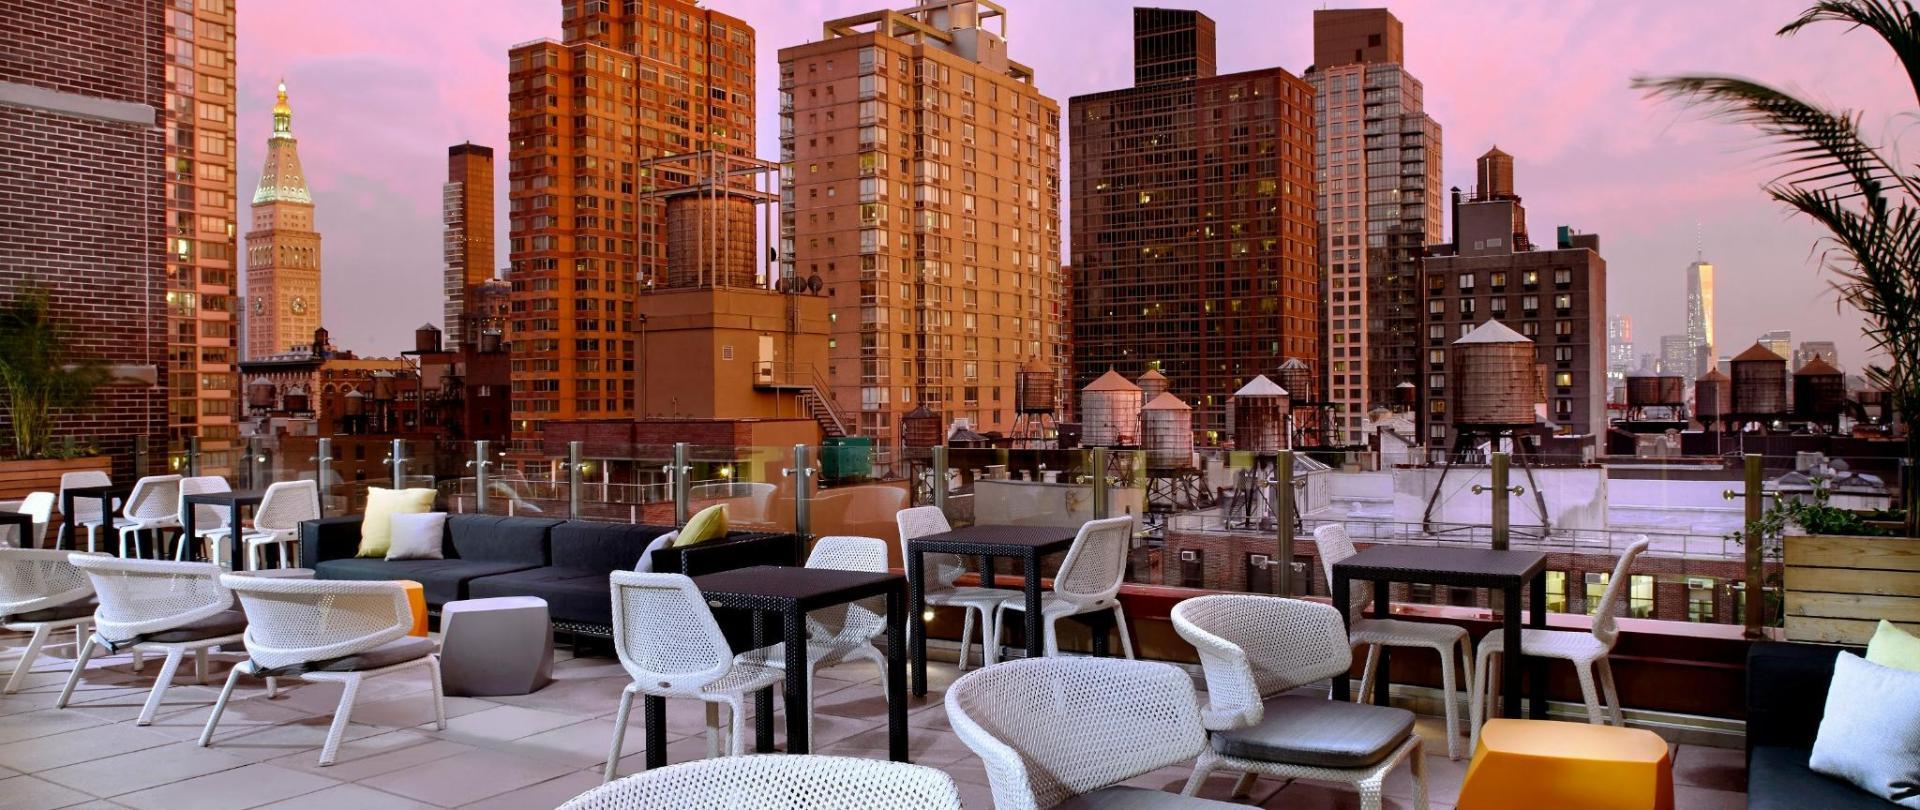 cam_chels_rooftop_lounge_2015.jpg